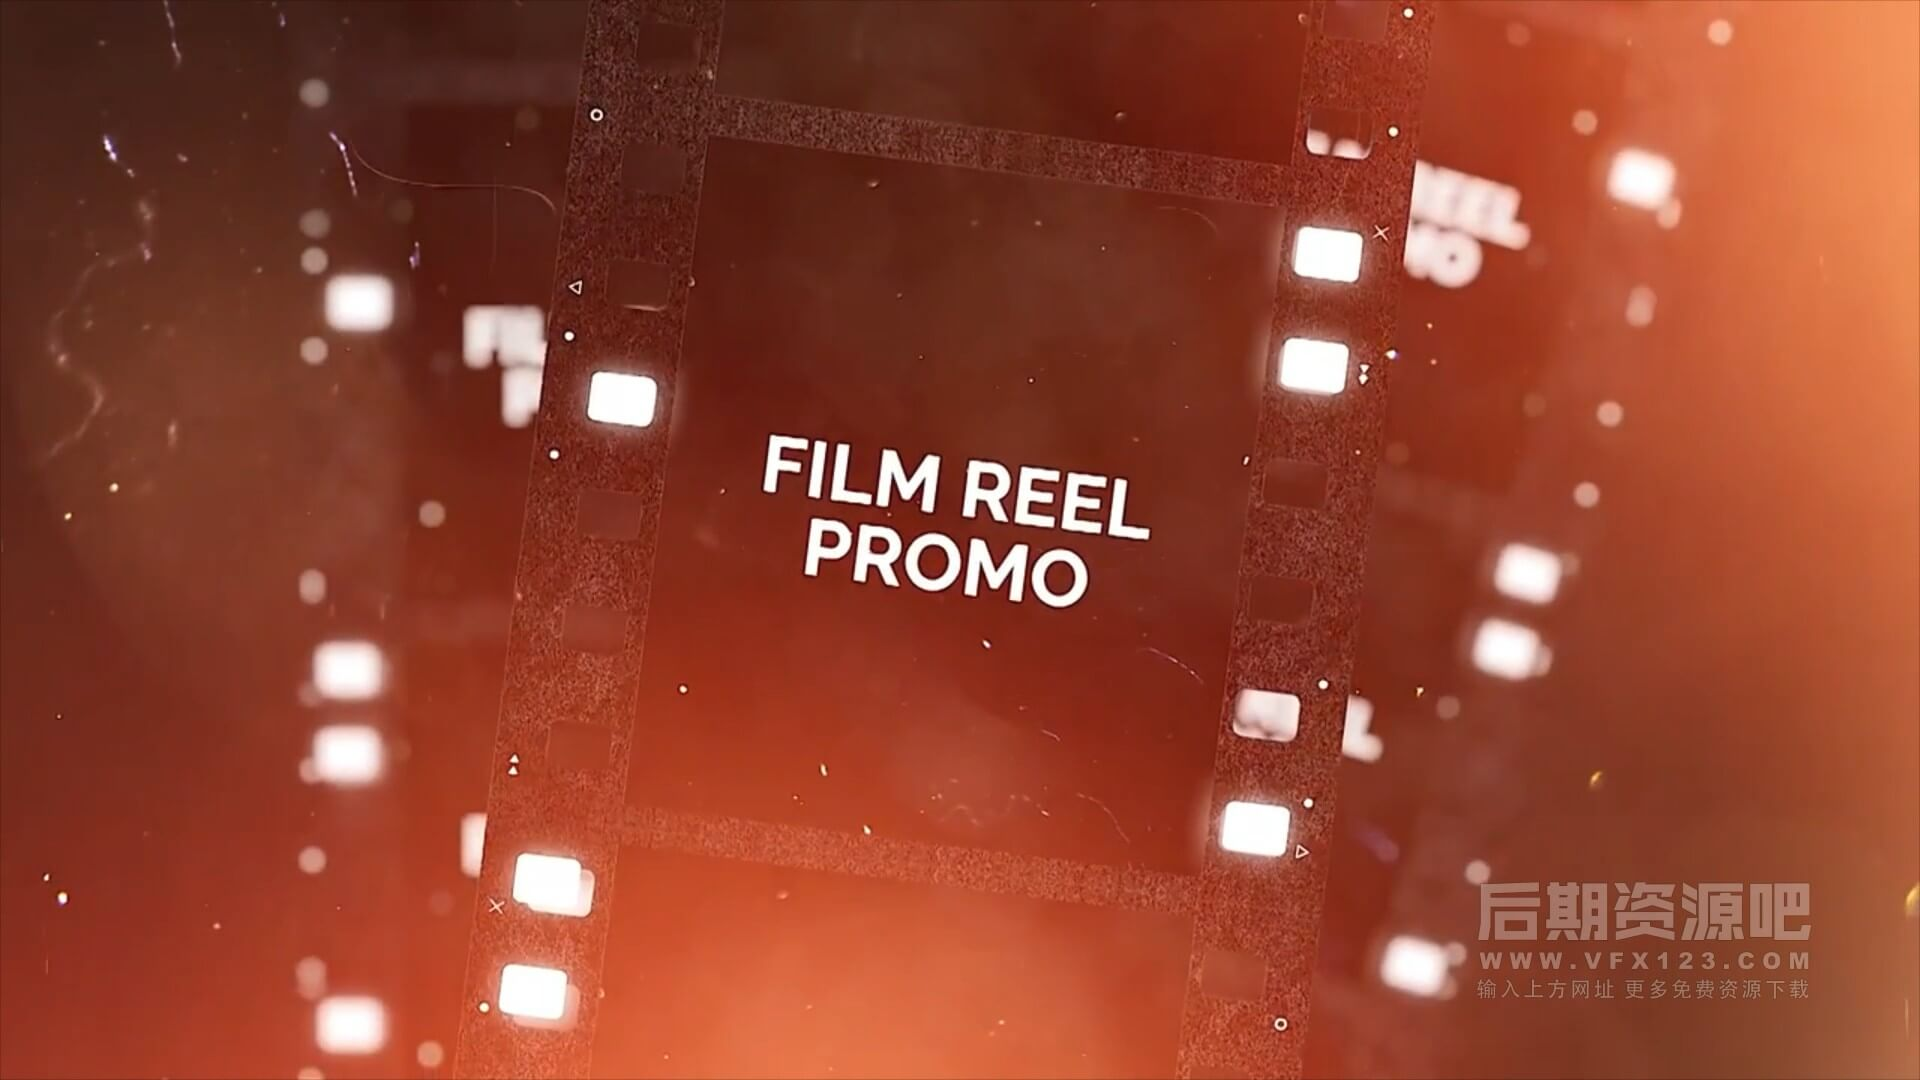 fcpx主题插件 复古胶卷漏光叠加效果回忆纪念相册模板 Film Reel Promo